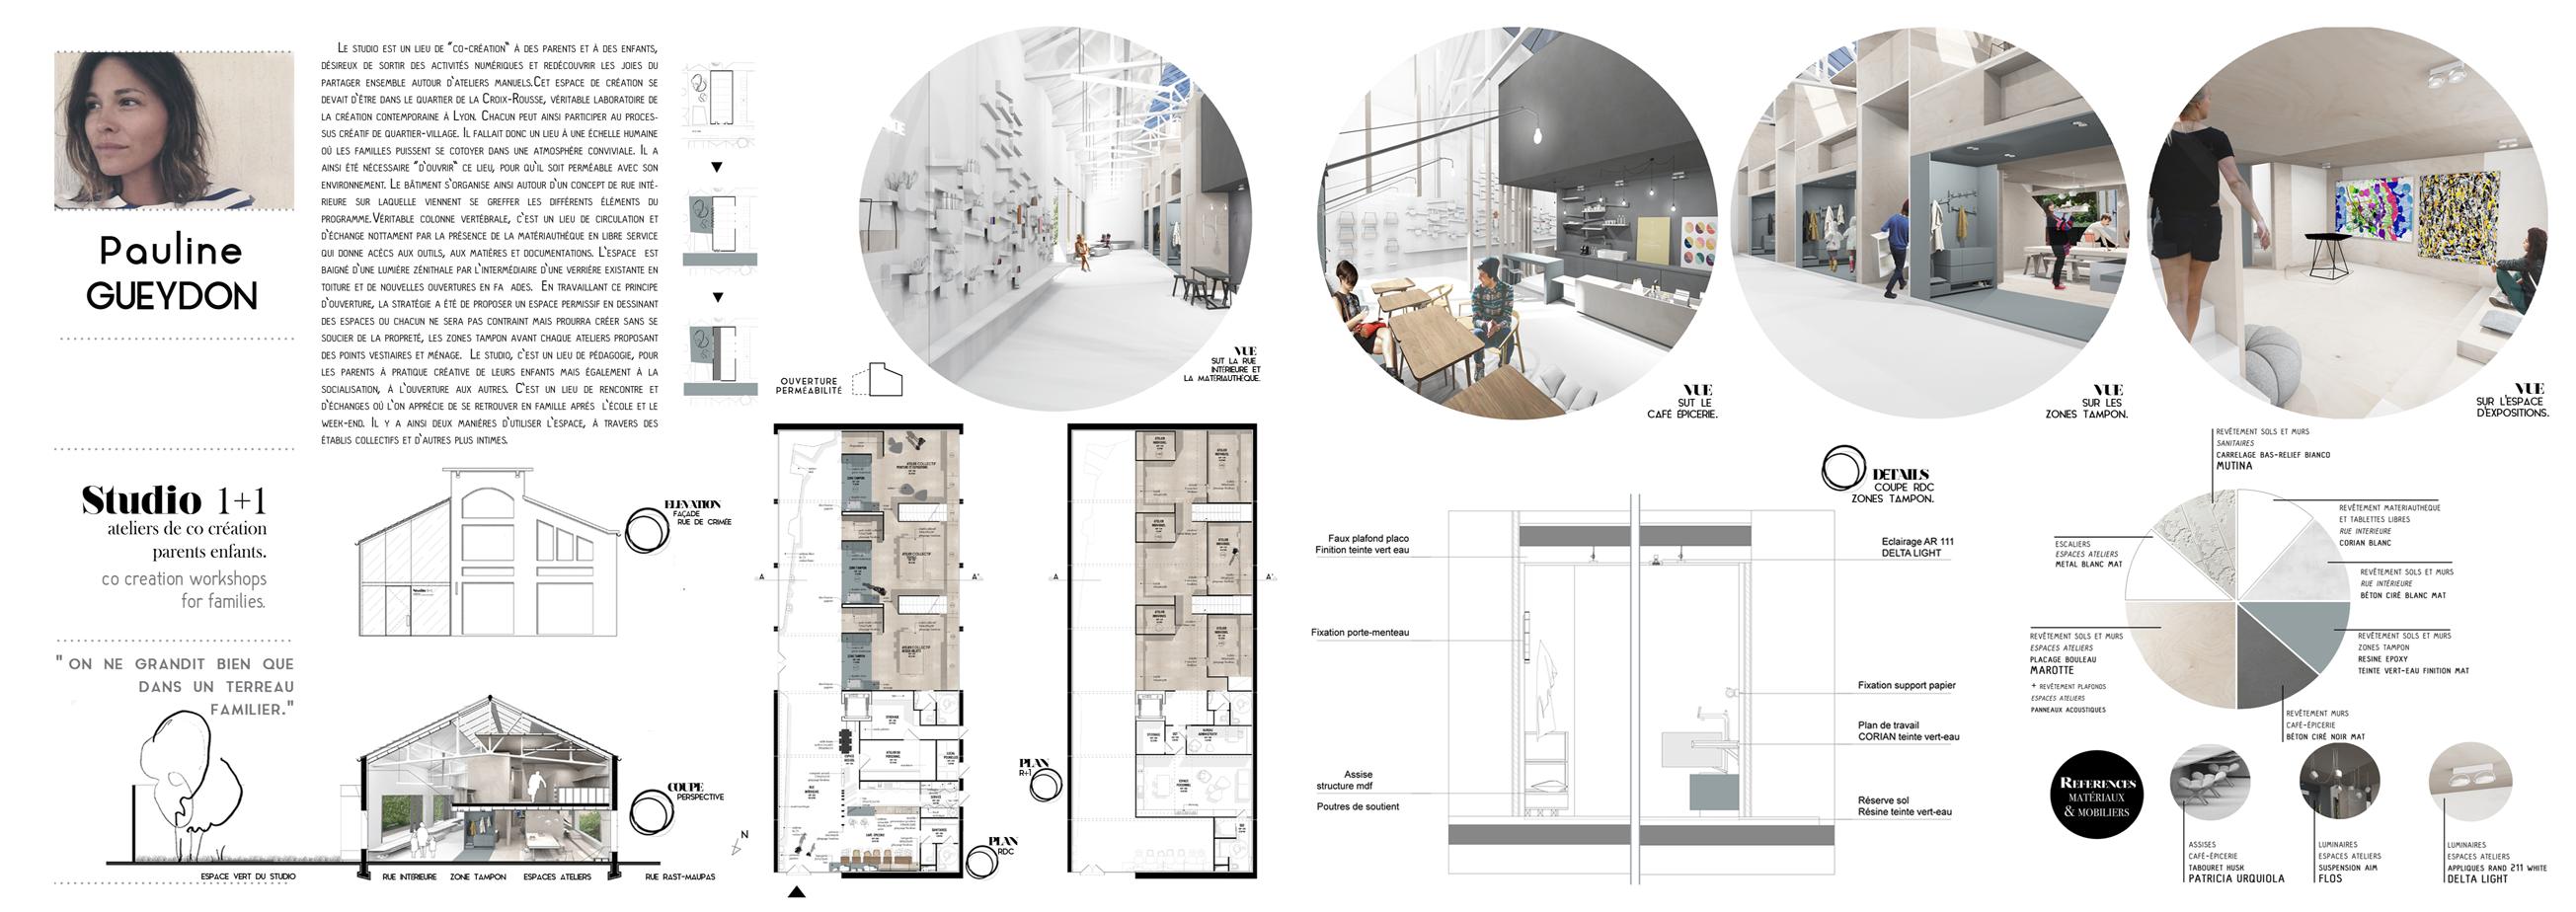 portfolio architecture etudiant ex69 humatraffin. Black Bedroom Furniture Sets. Home Design Ideas